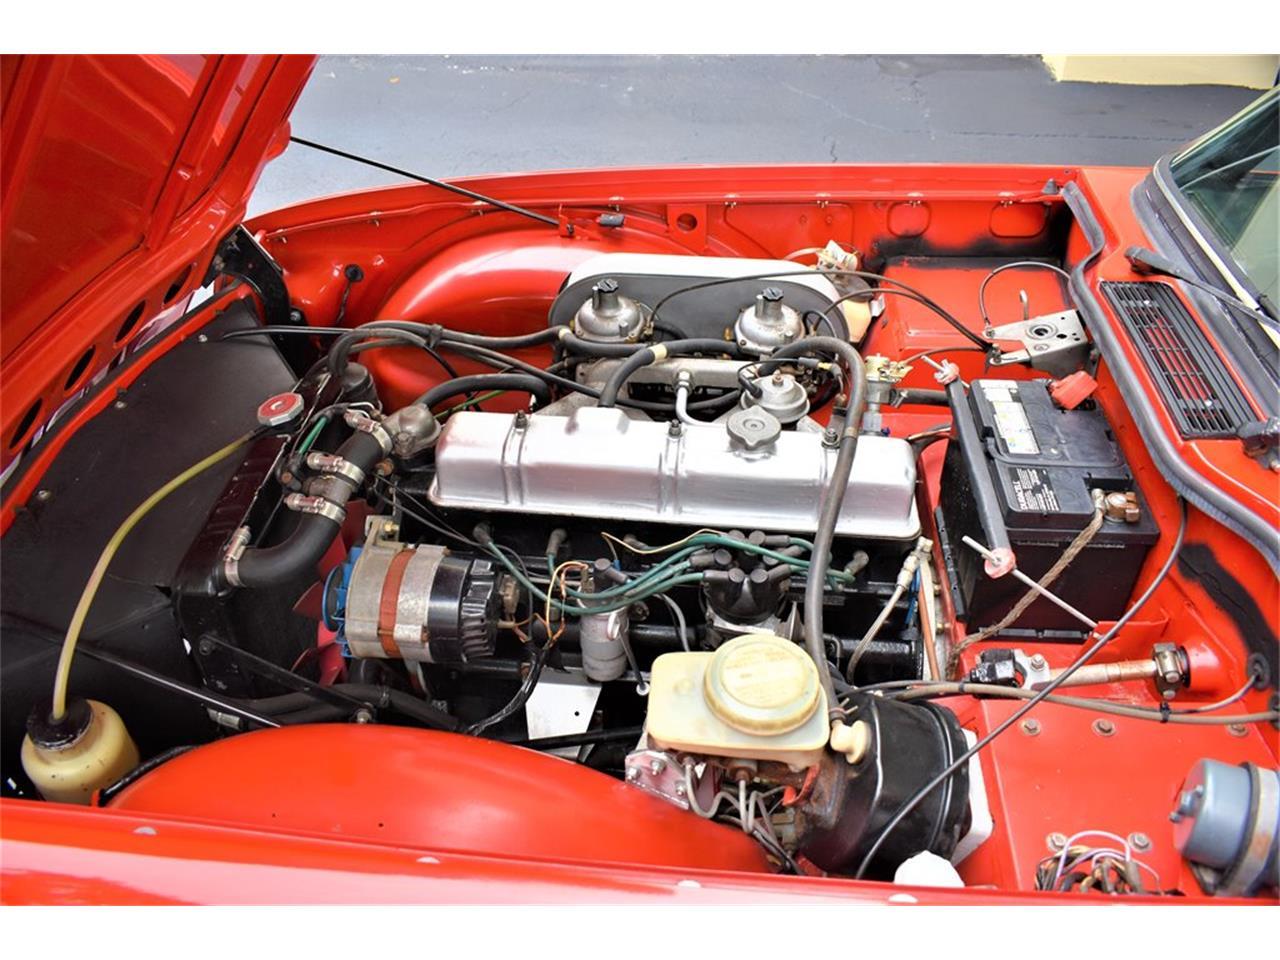 1975 Triumph TR6 (CC-1297390) for sale in Lakeland, Florida